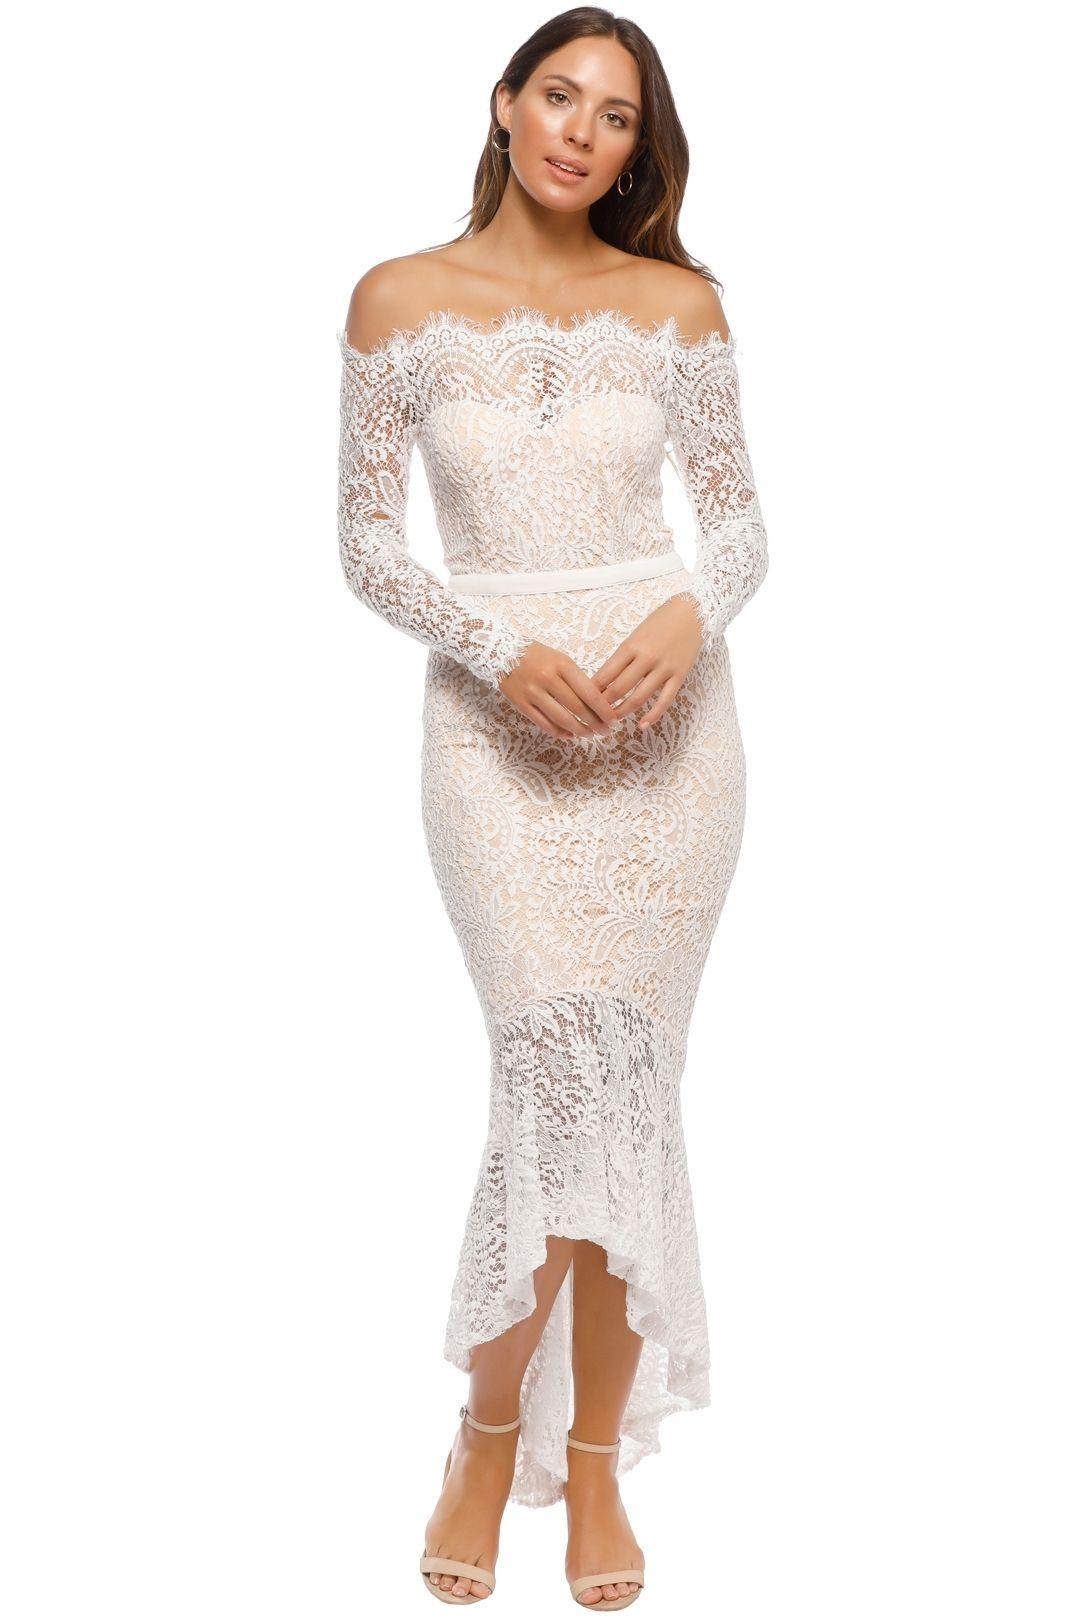 Elle Zeitoune - Marchesa Gown - White - Front